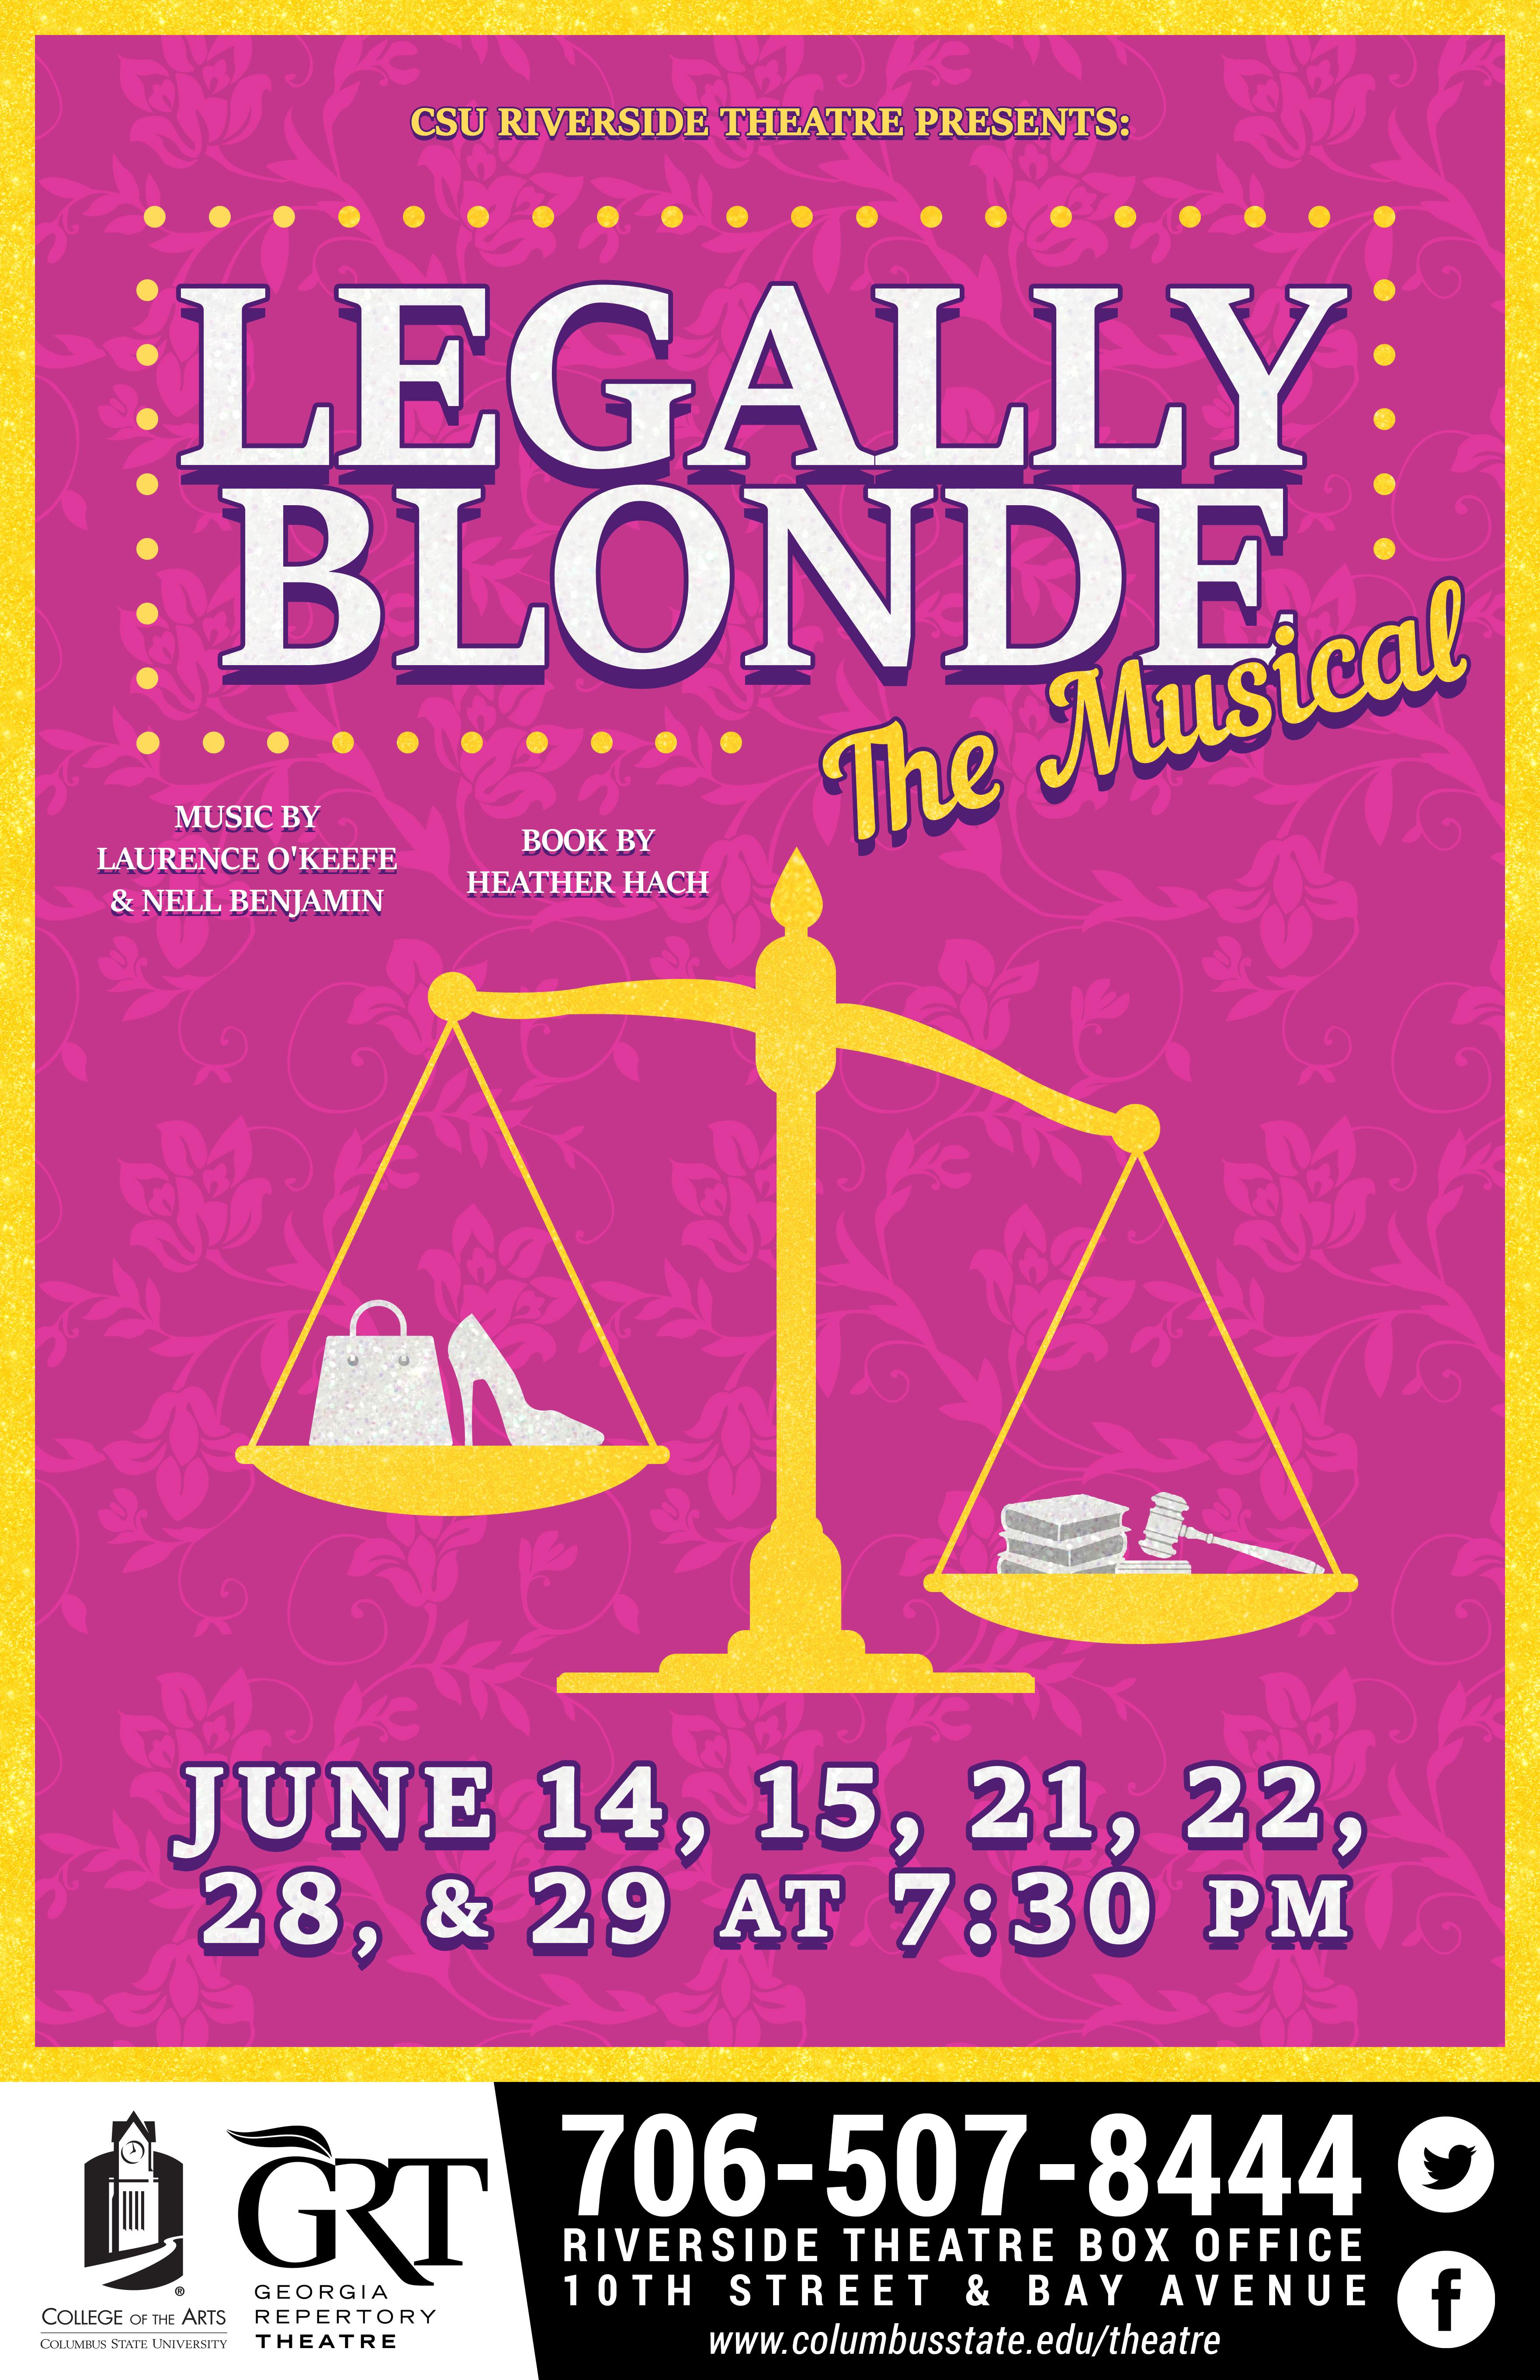 CSU Theatre: Legally Blonde